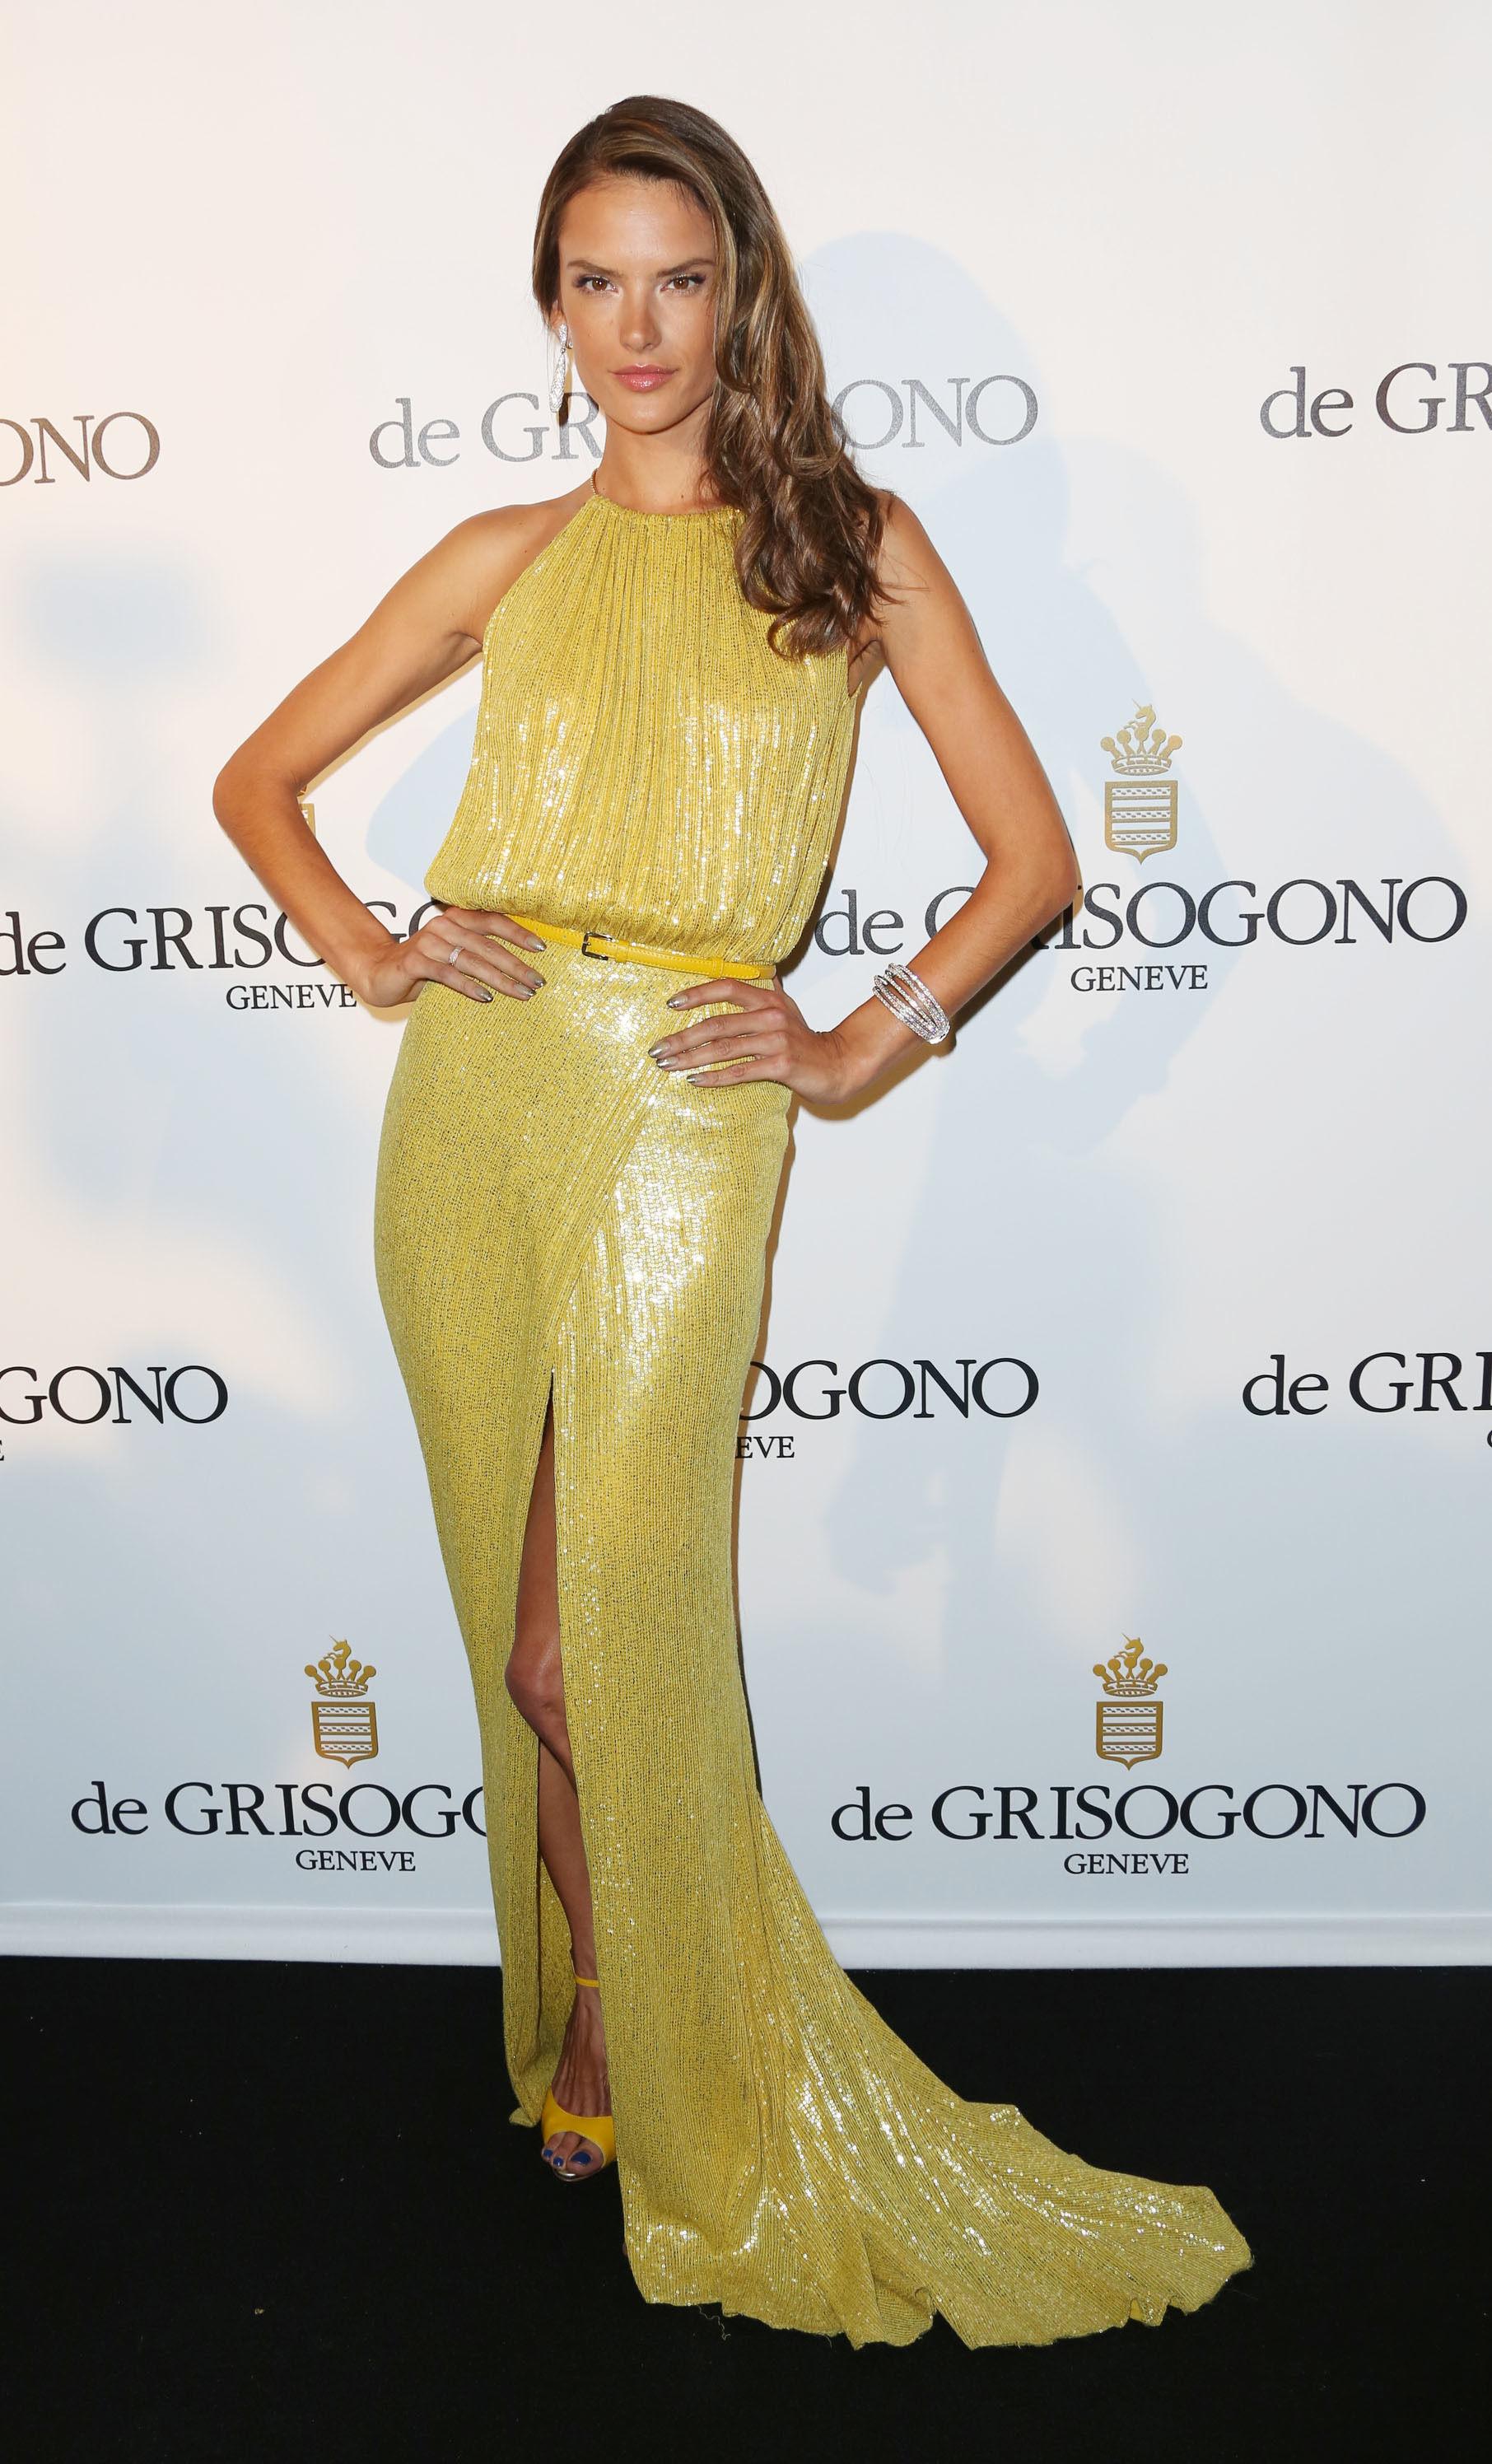 Apenas pare, Alessandra Ambrósio!